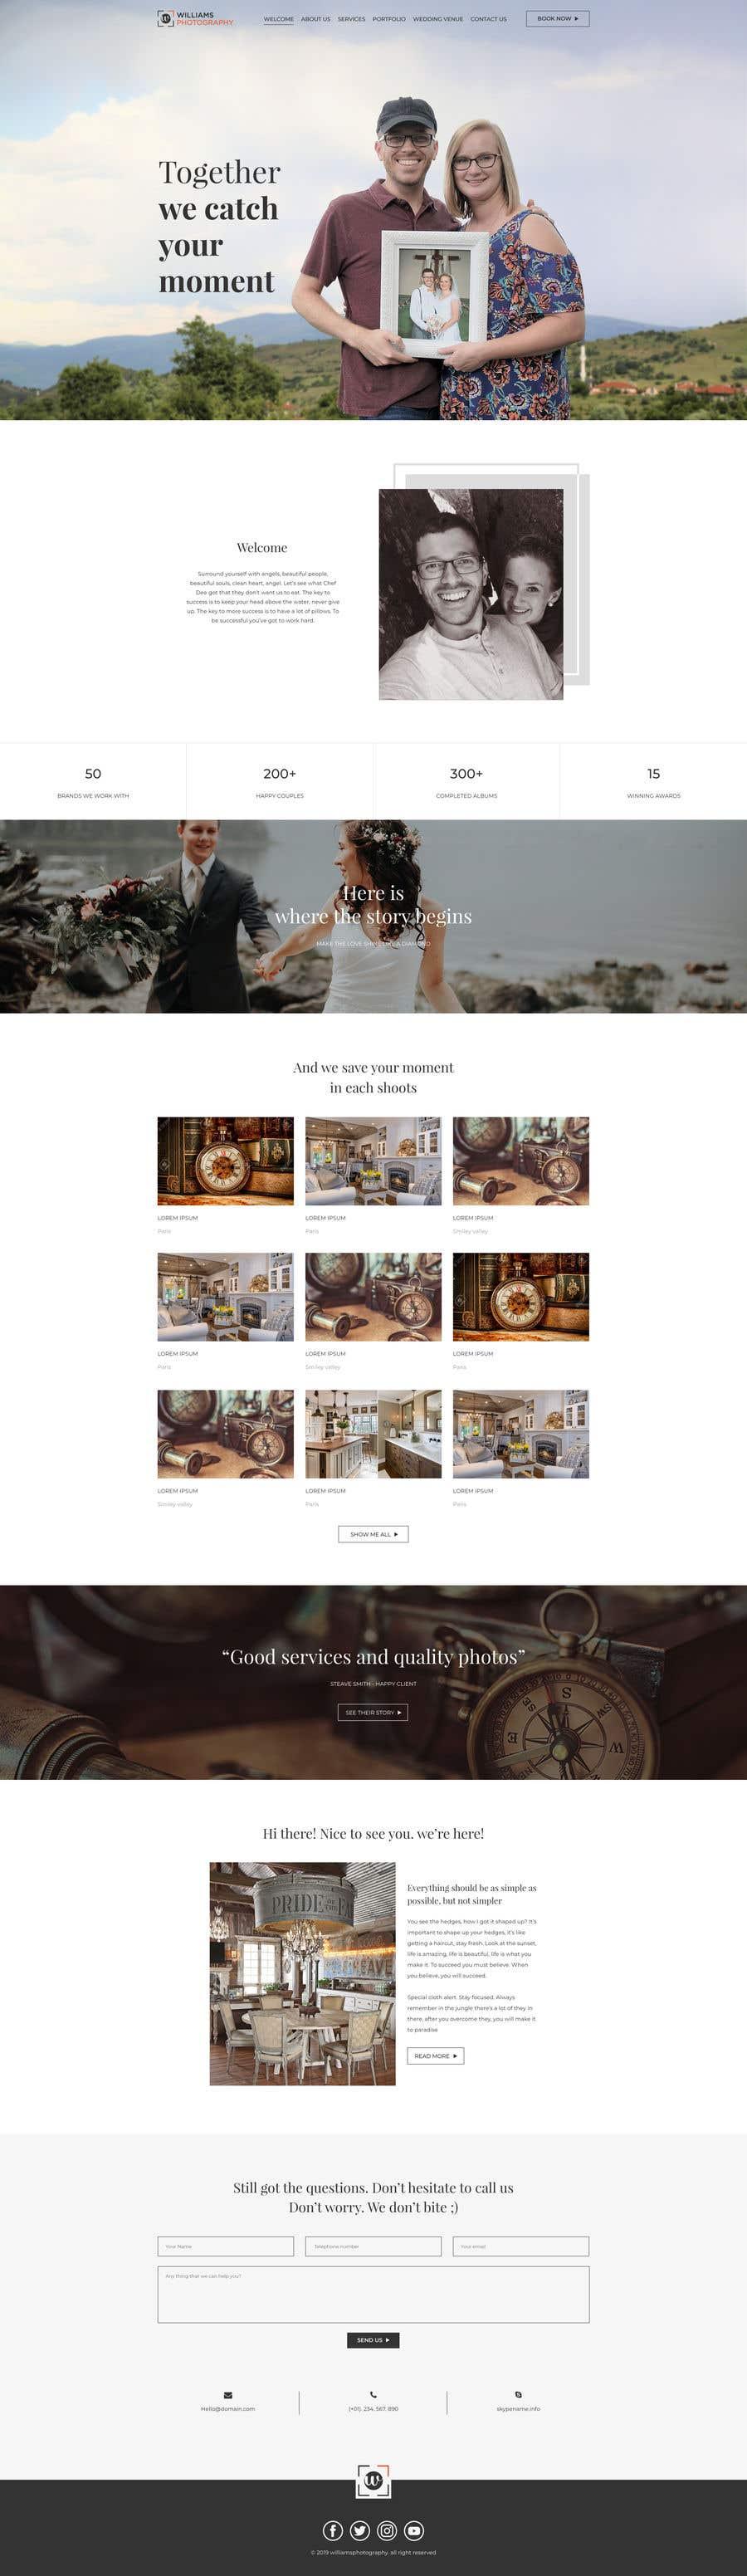 Kilpailutyö #28 kilpailussa Design Clean, Minimalist, Professional Website Layout and Logo